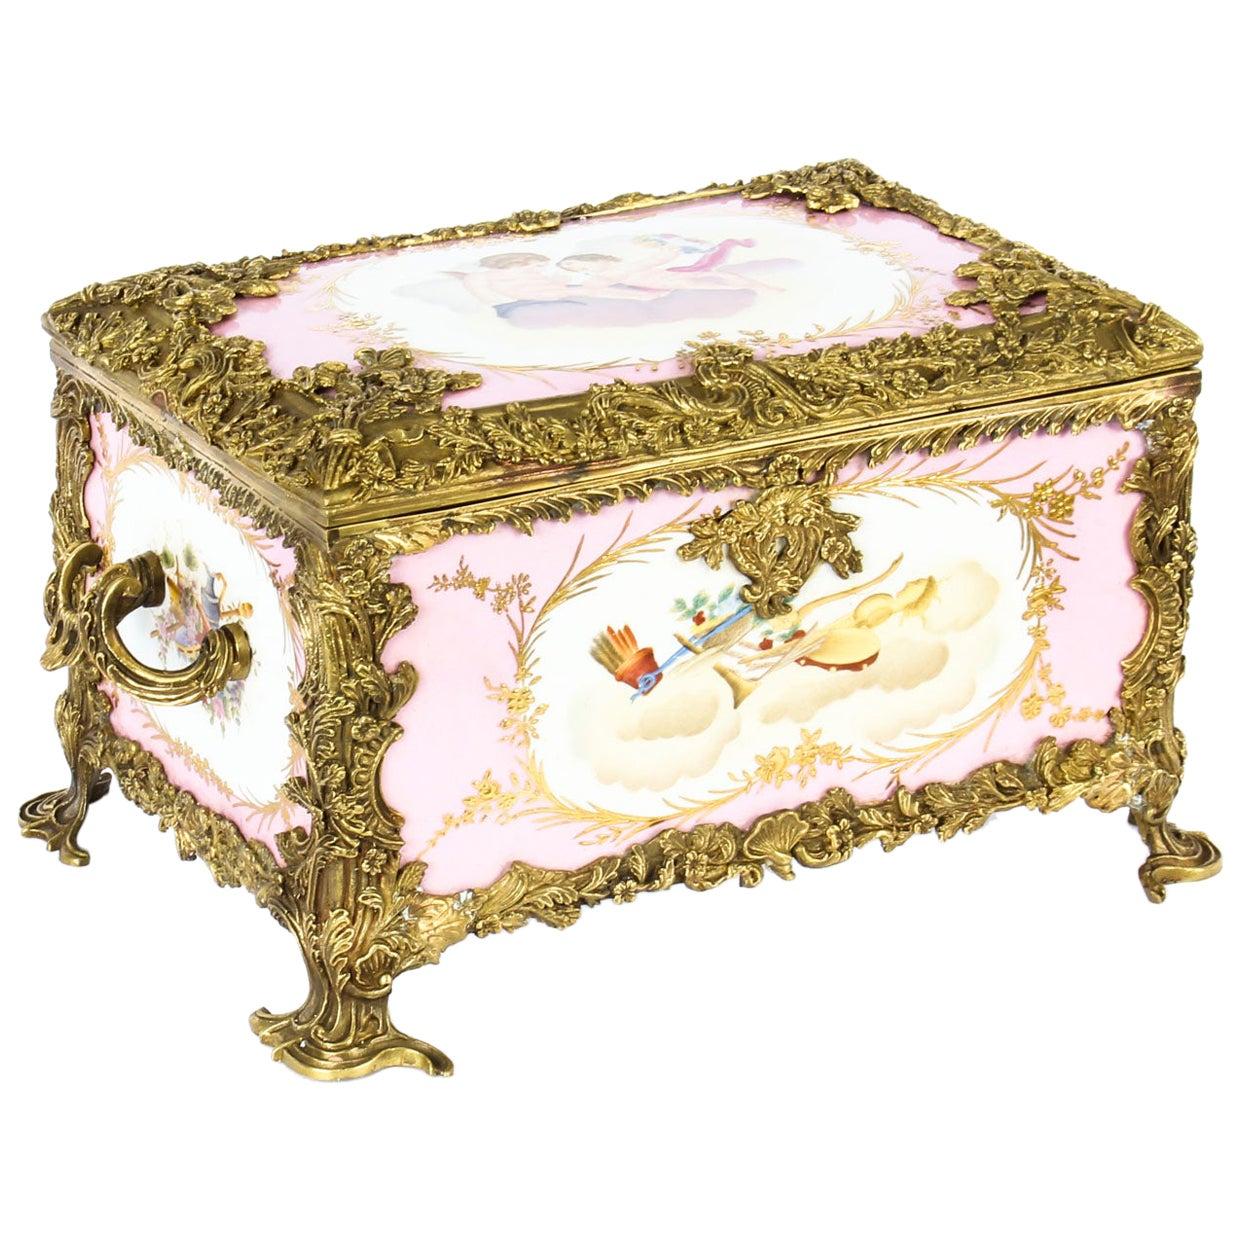 Vintage Russian Revival Rose Pink Porcelain Jewellery Casket, 20th Century